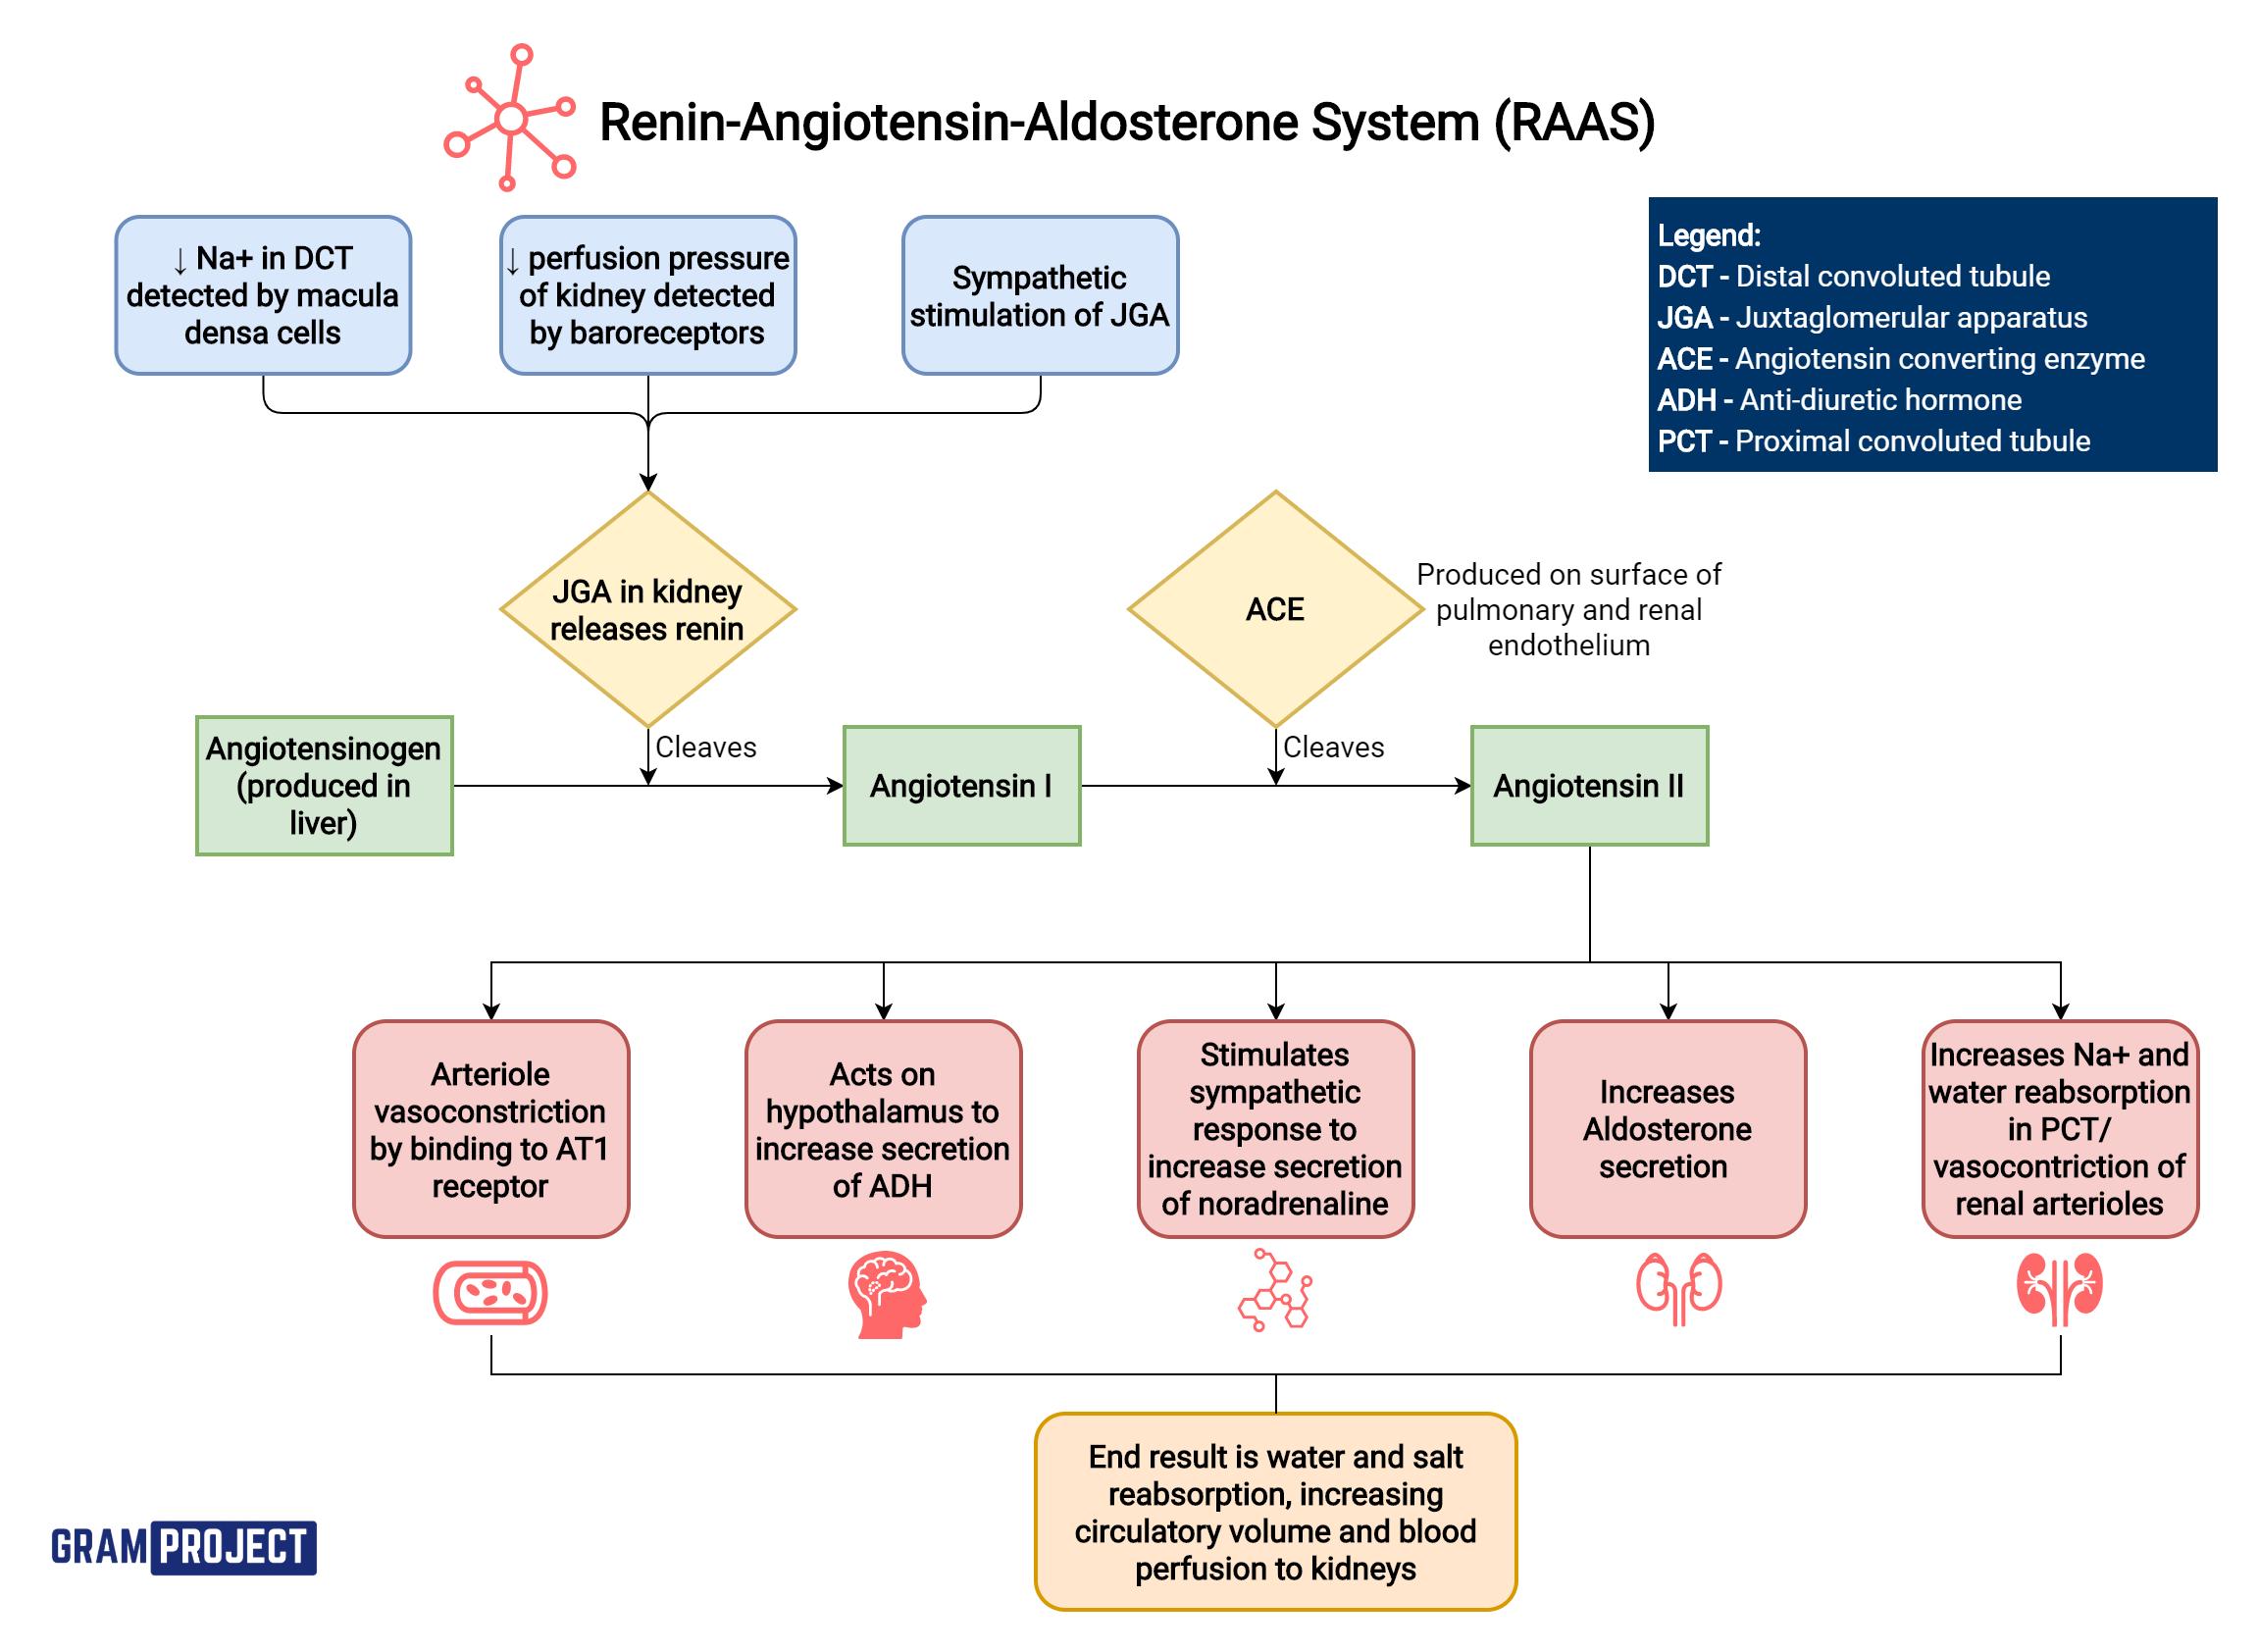 Renin-Angiotensin-Aldosterone System flowchart